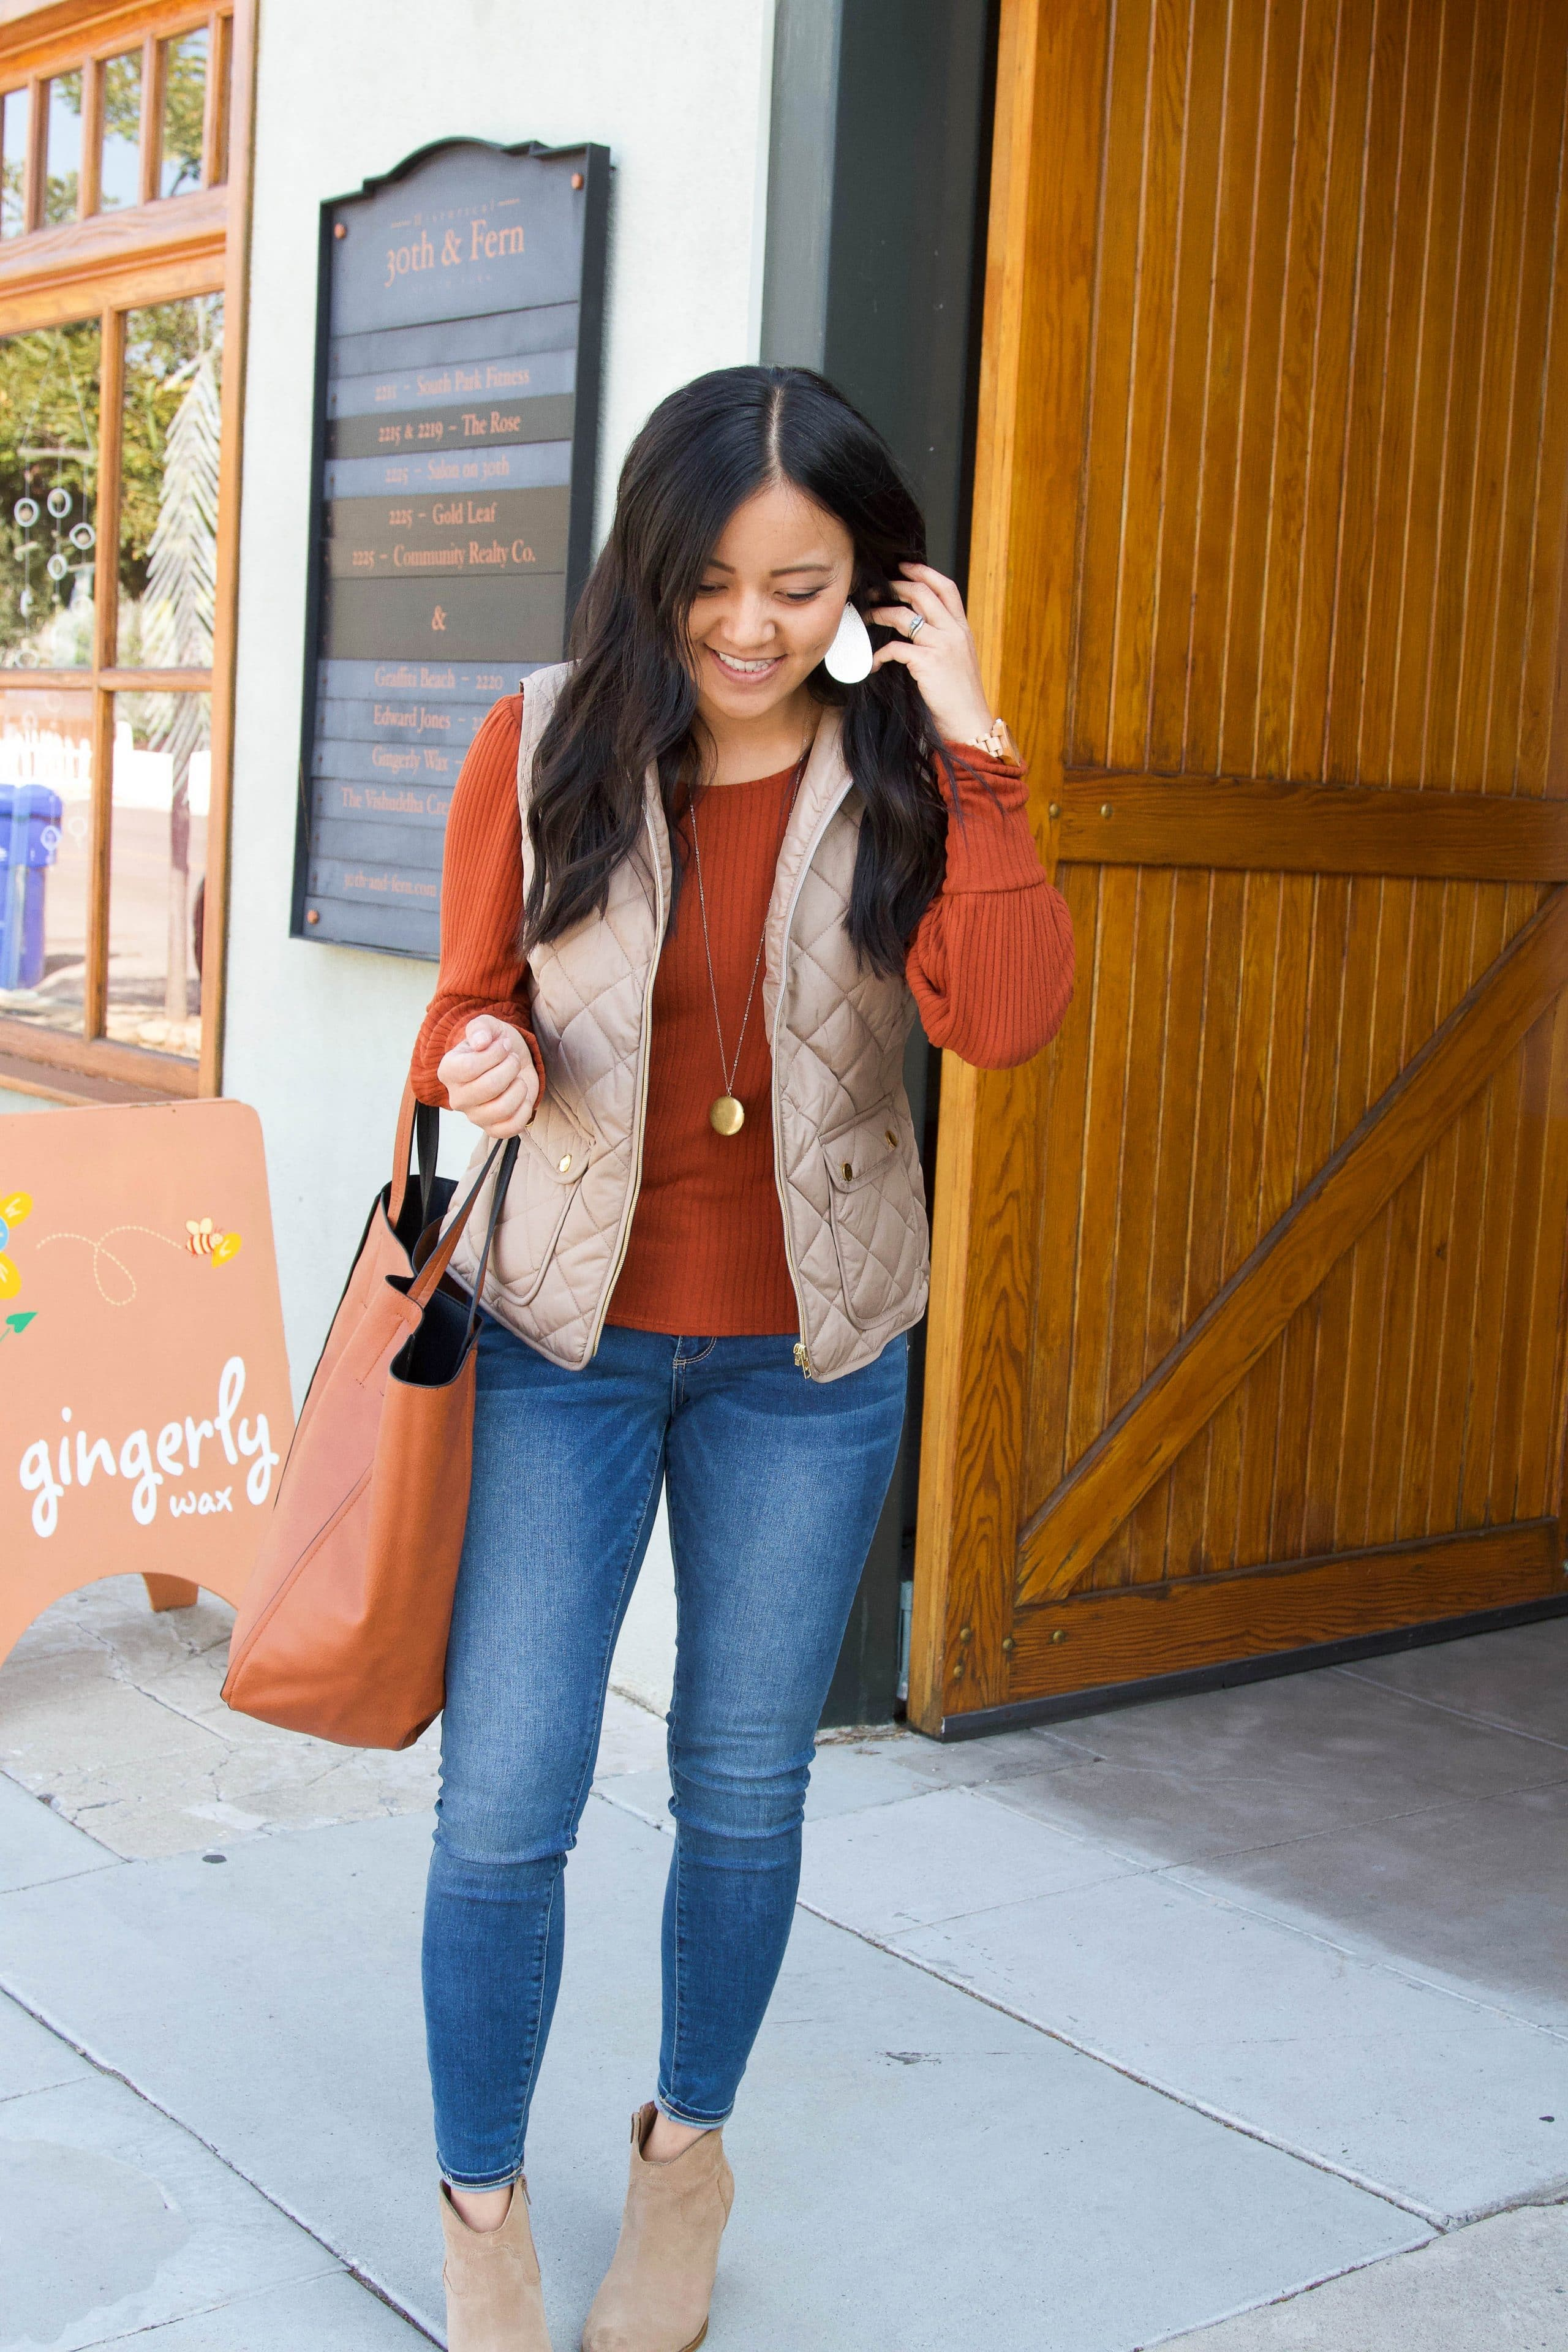 rust orange sweater + tan vest + skinny jeans + taupe booties + cognac tote